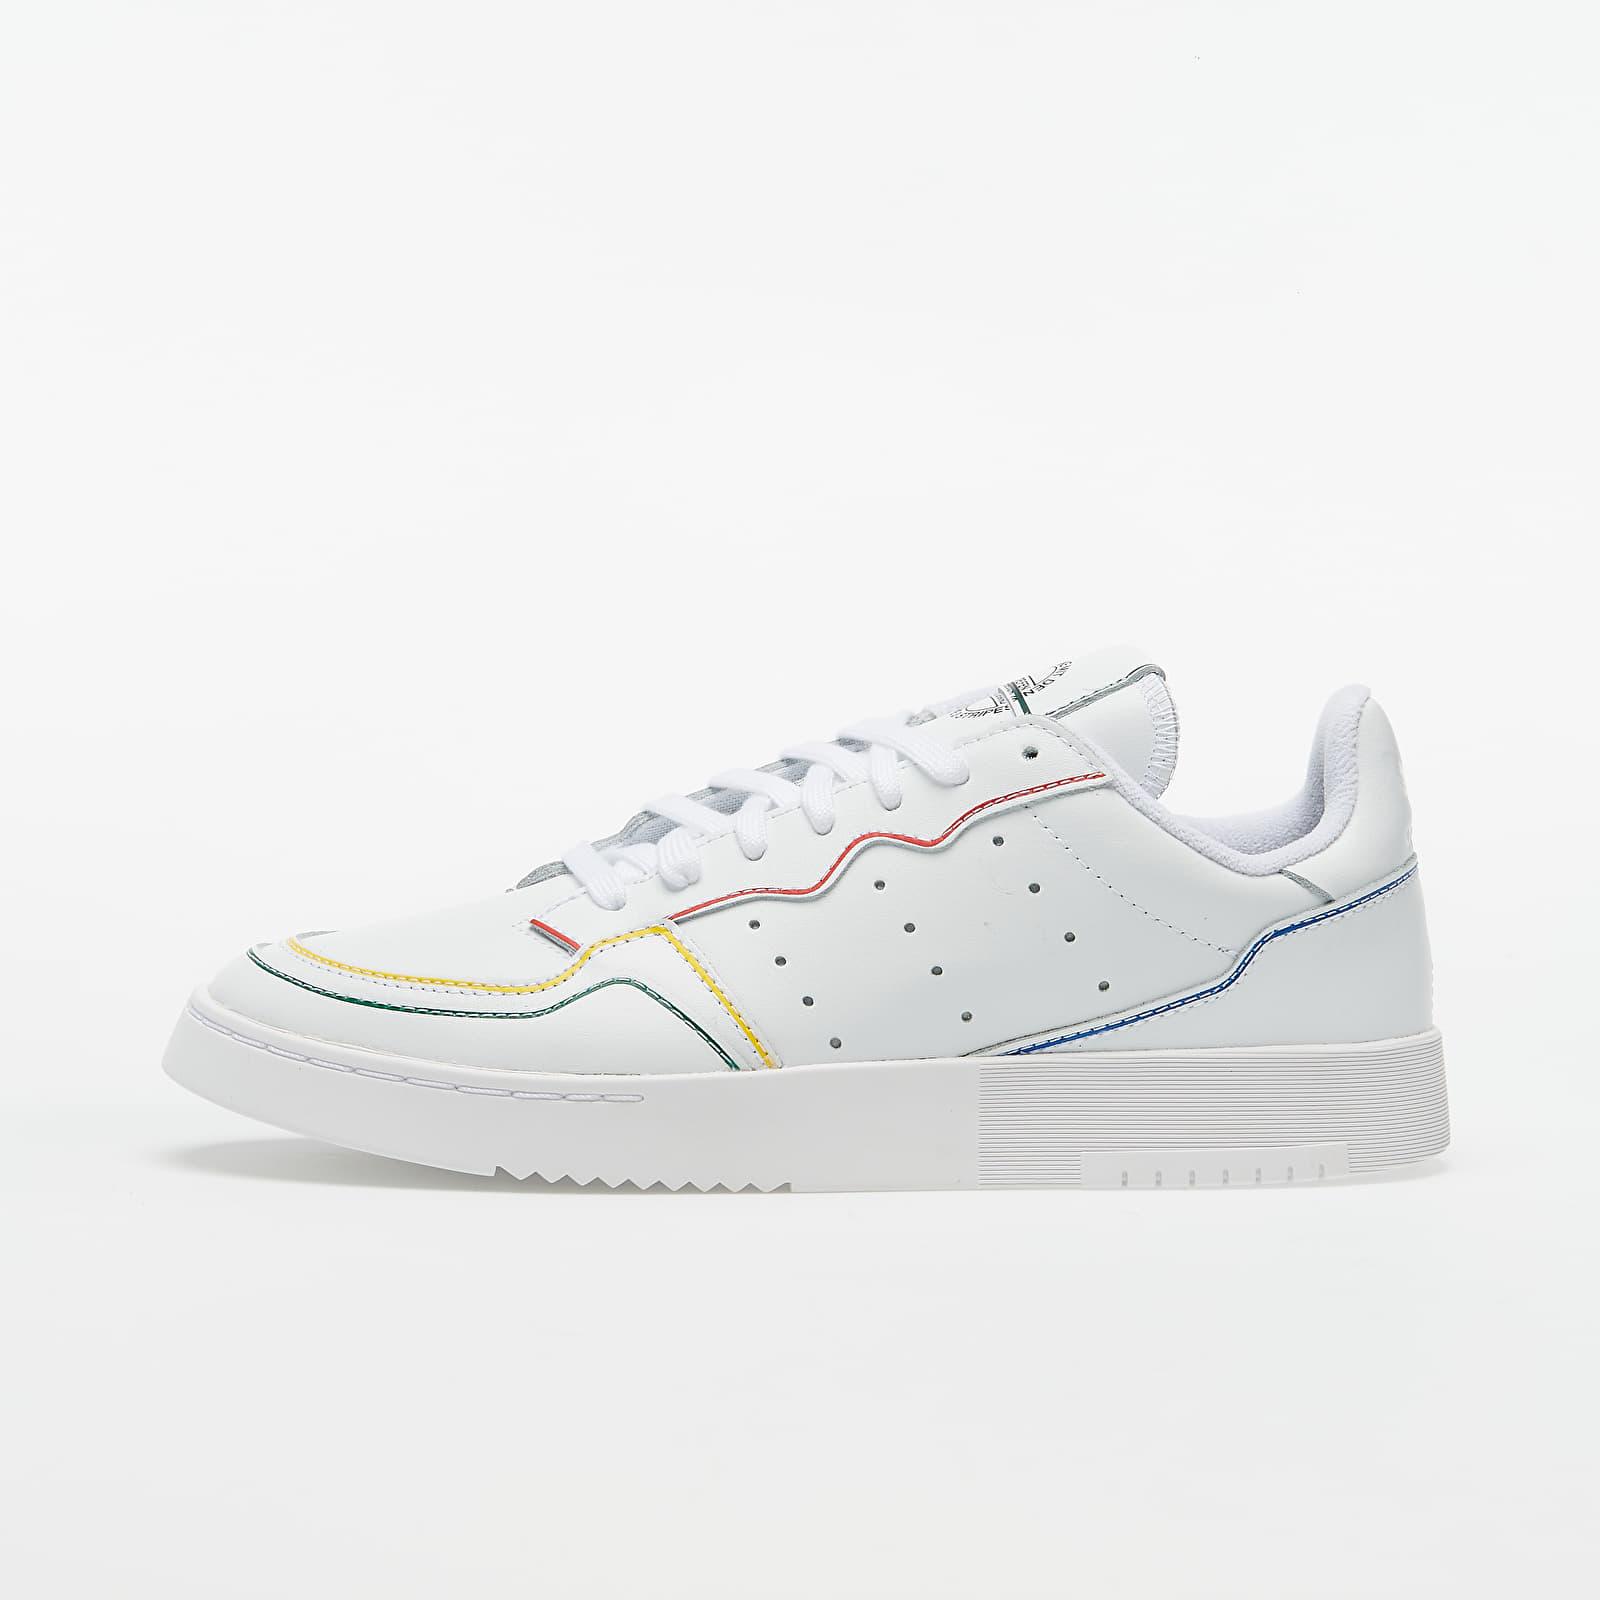 Men's shoes adidas Supercourt Ftw White/ Ftw White/ Blue